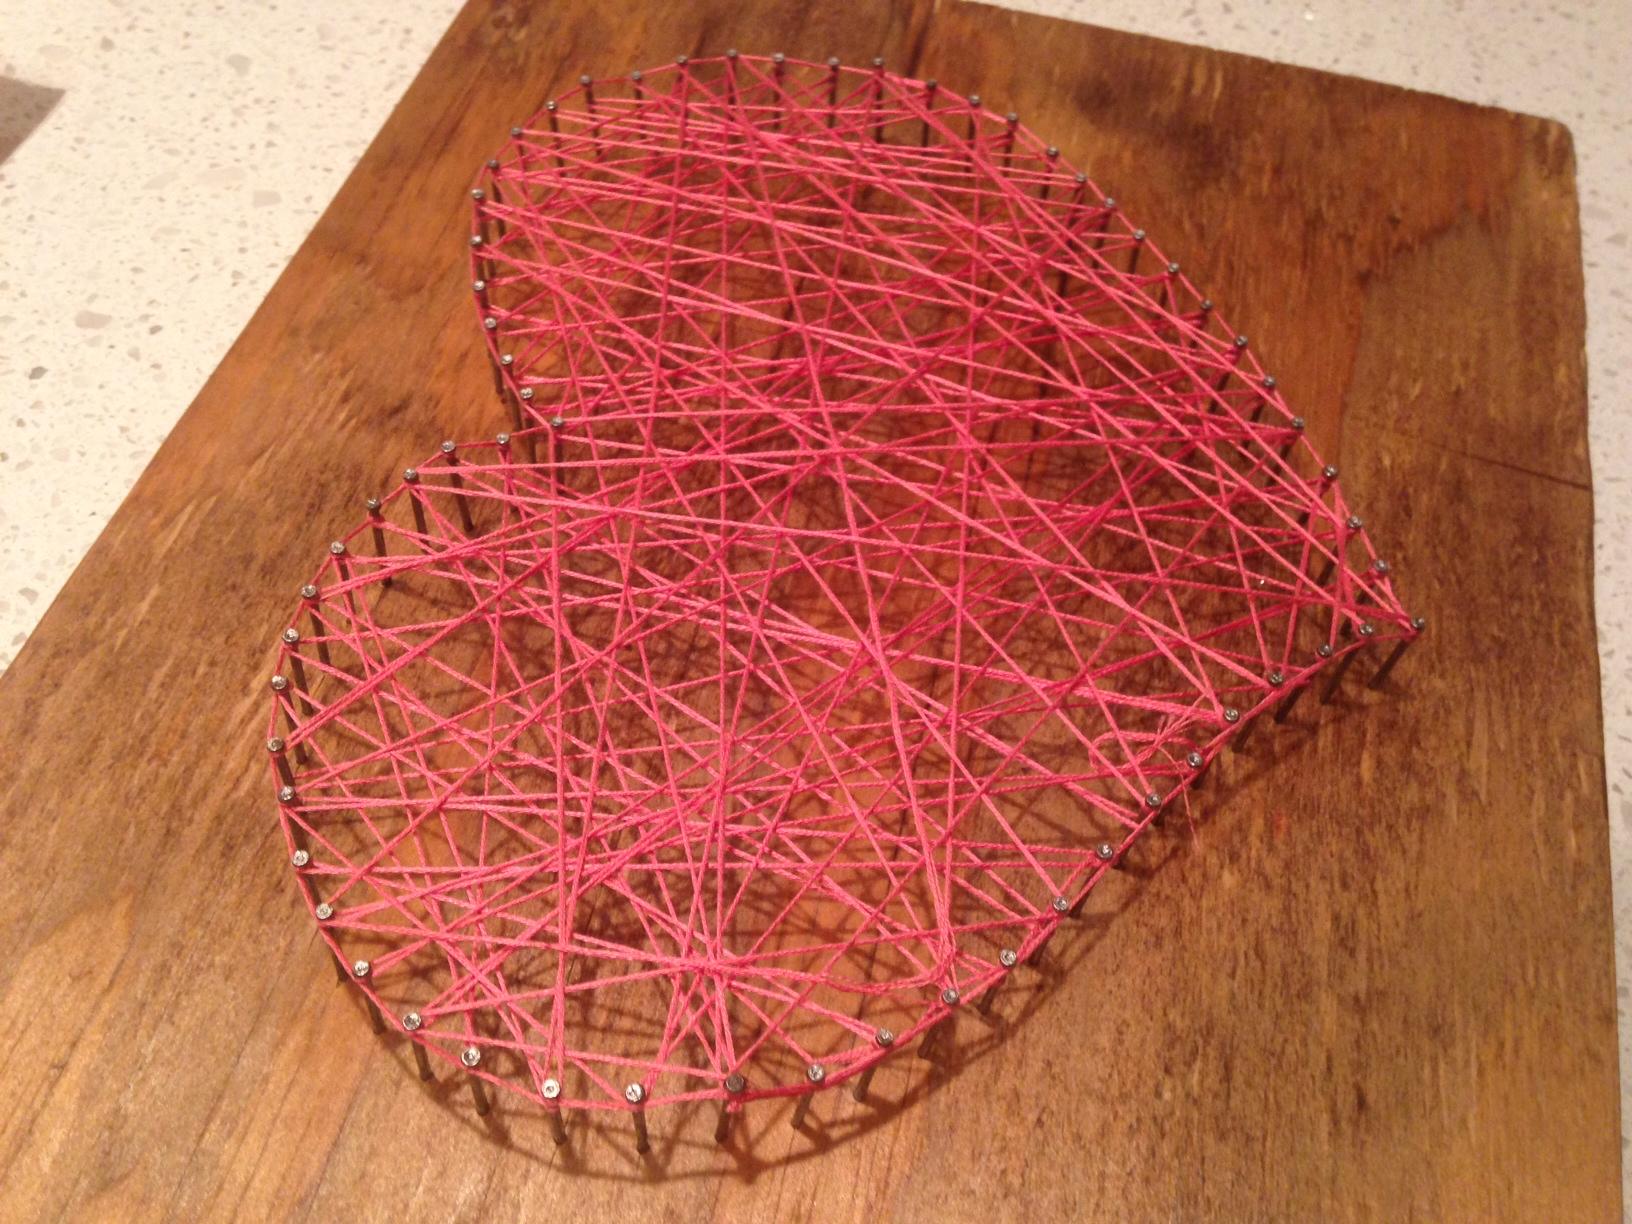 Image 2 of DIY String Heart